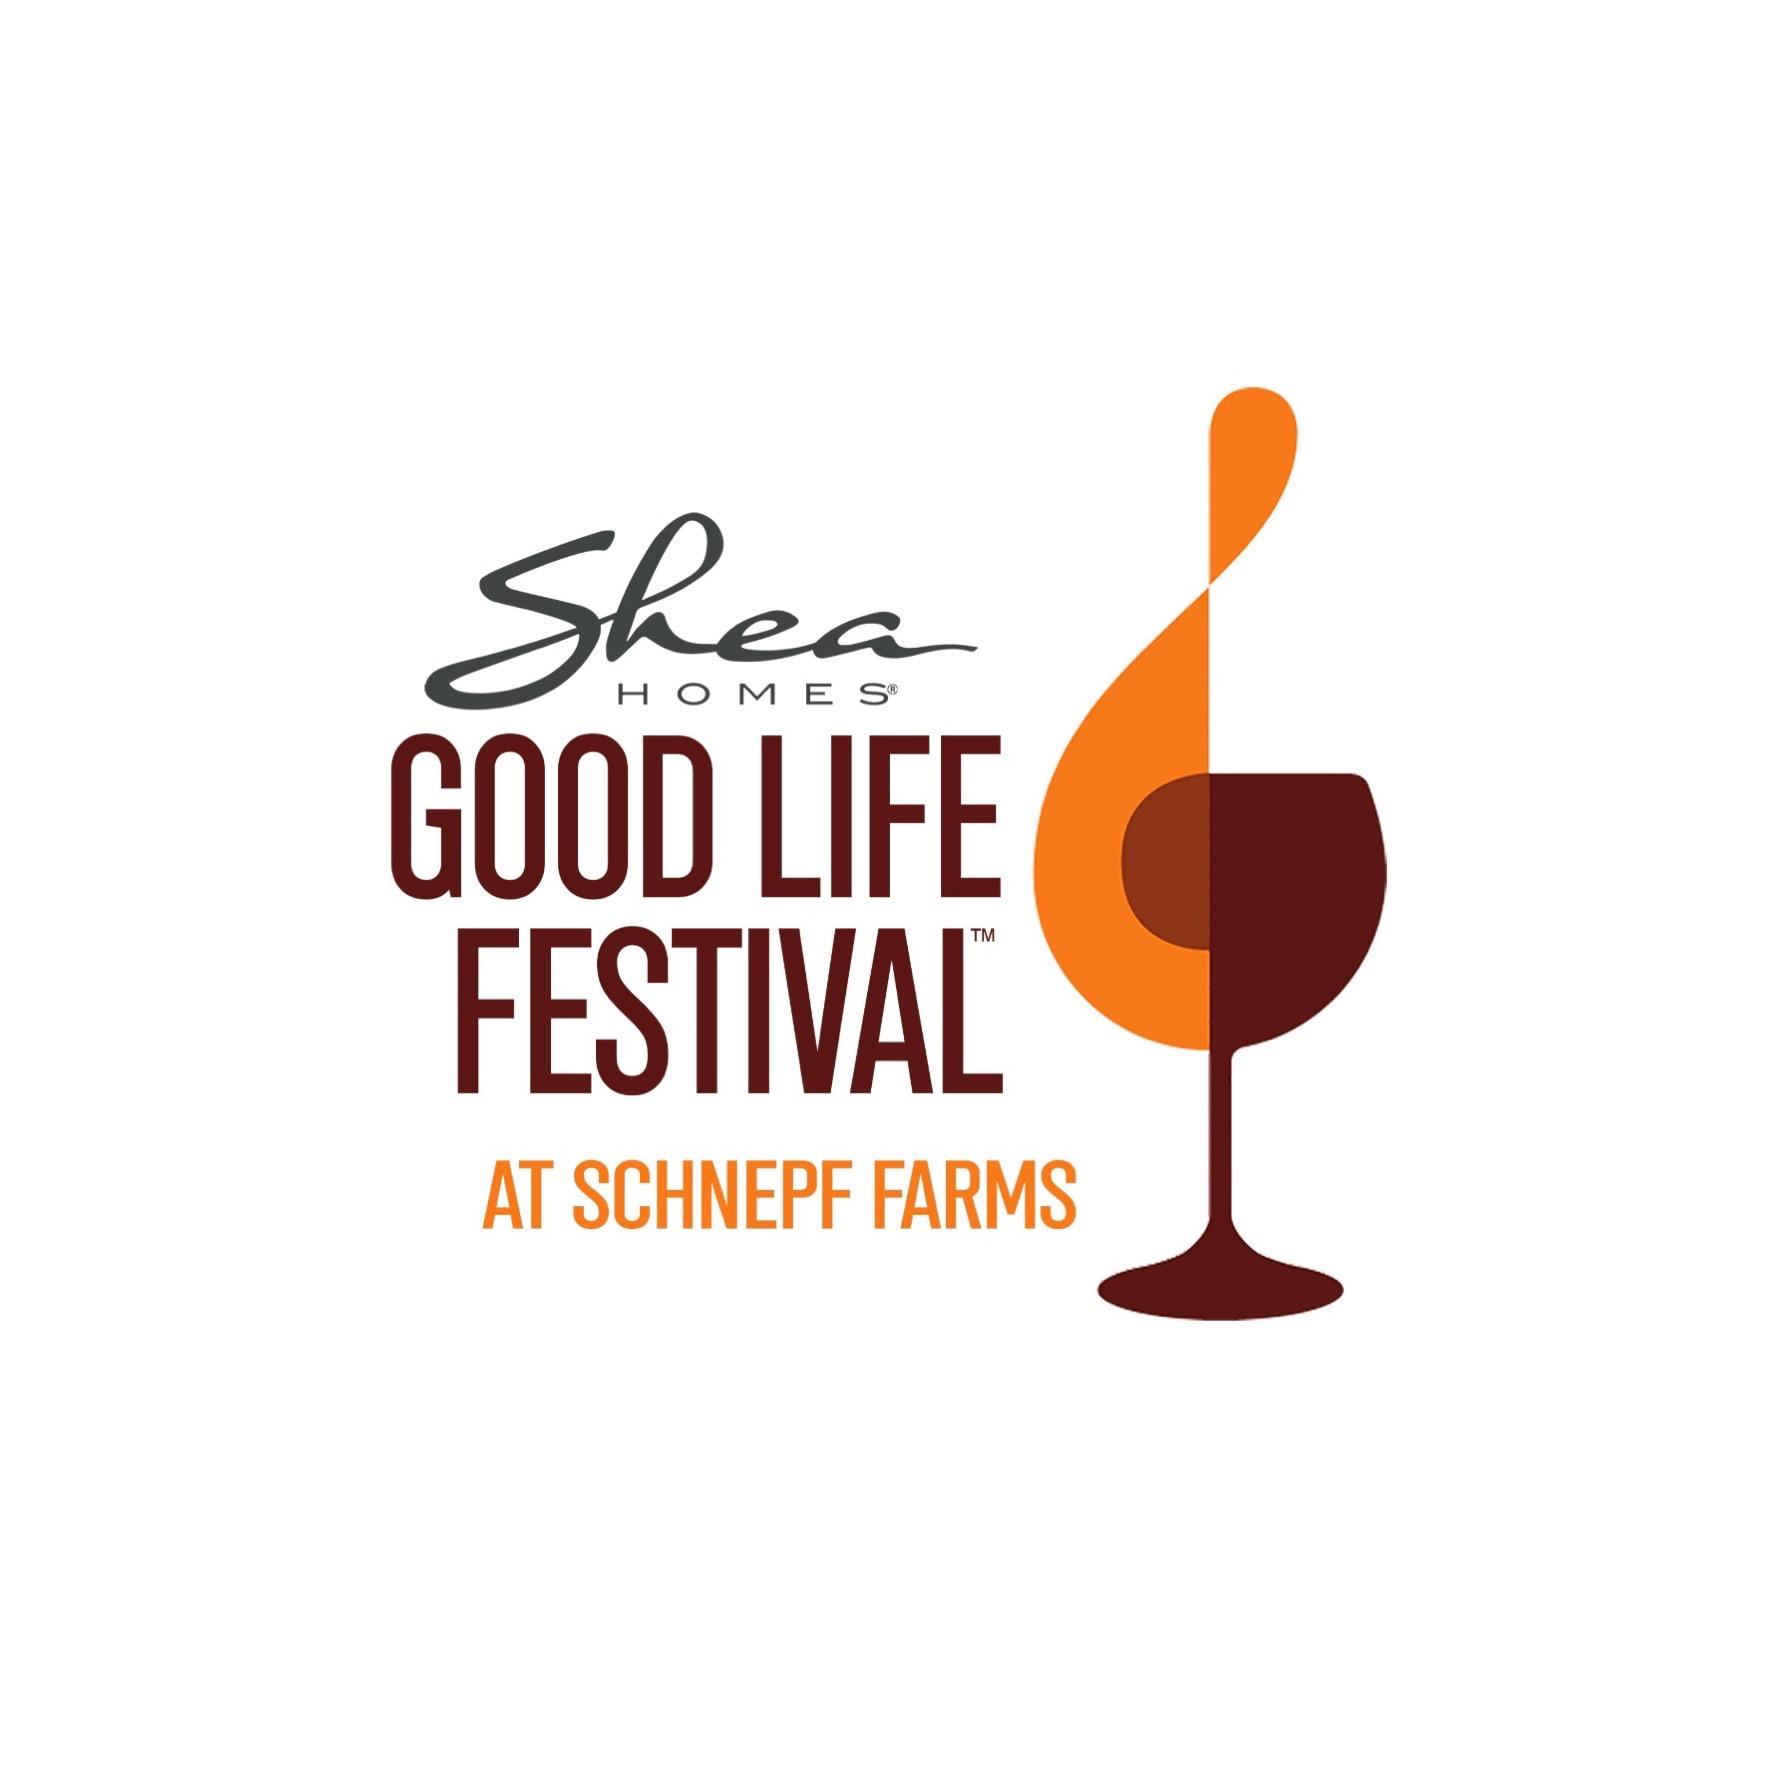 Shea Homes Good Life Festival Queen Creek Az 85142